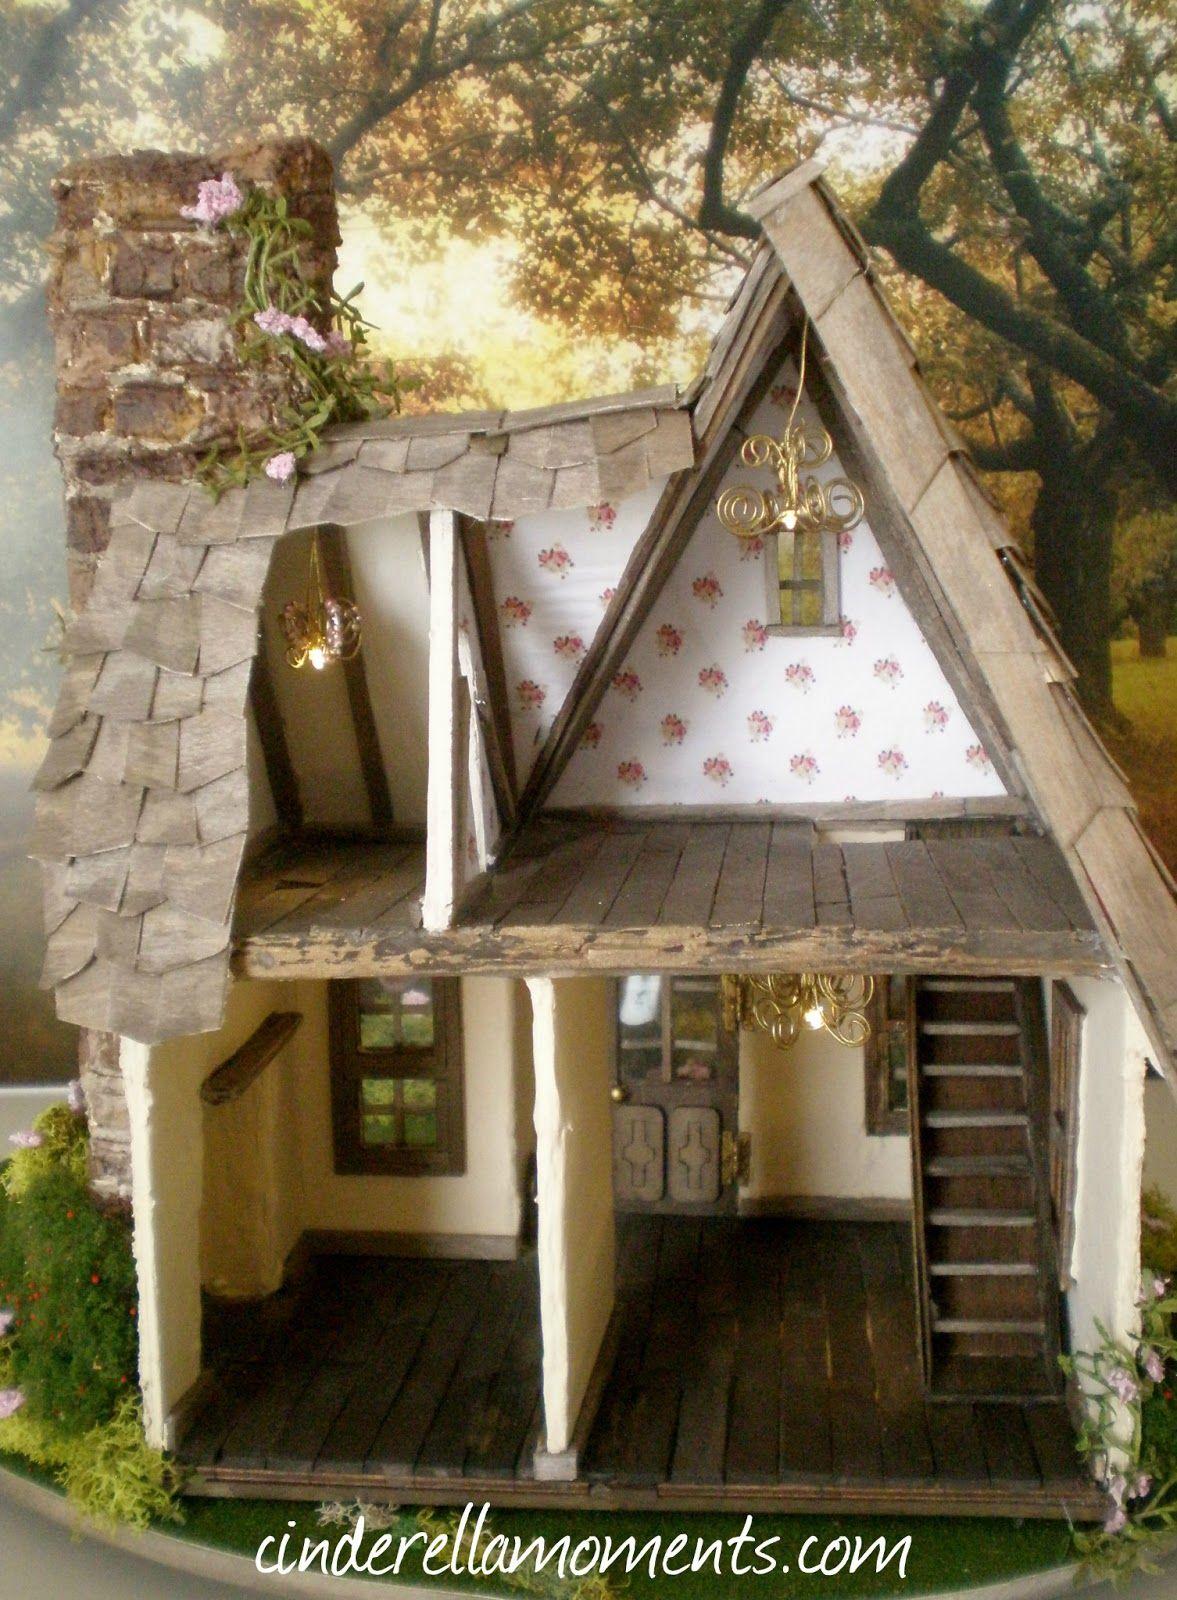 cinderella moments miss read 39 s english cottage cinderellamoments custom dollhouses. Black Bedroom Furniture Sets. Home Design Ideas